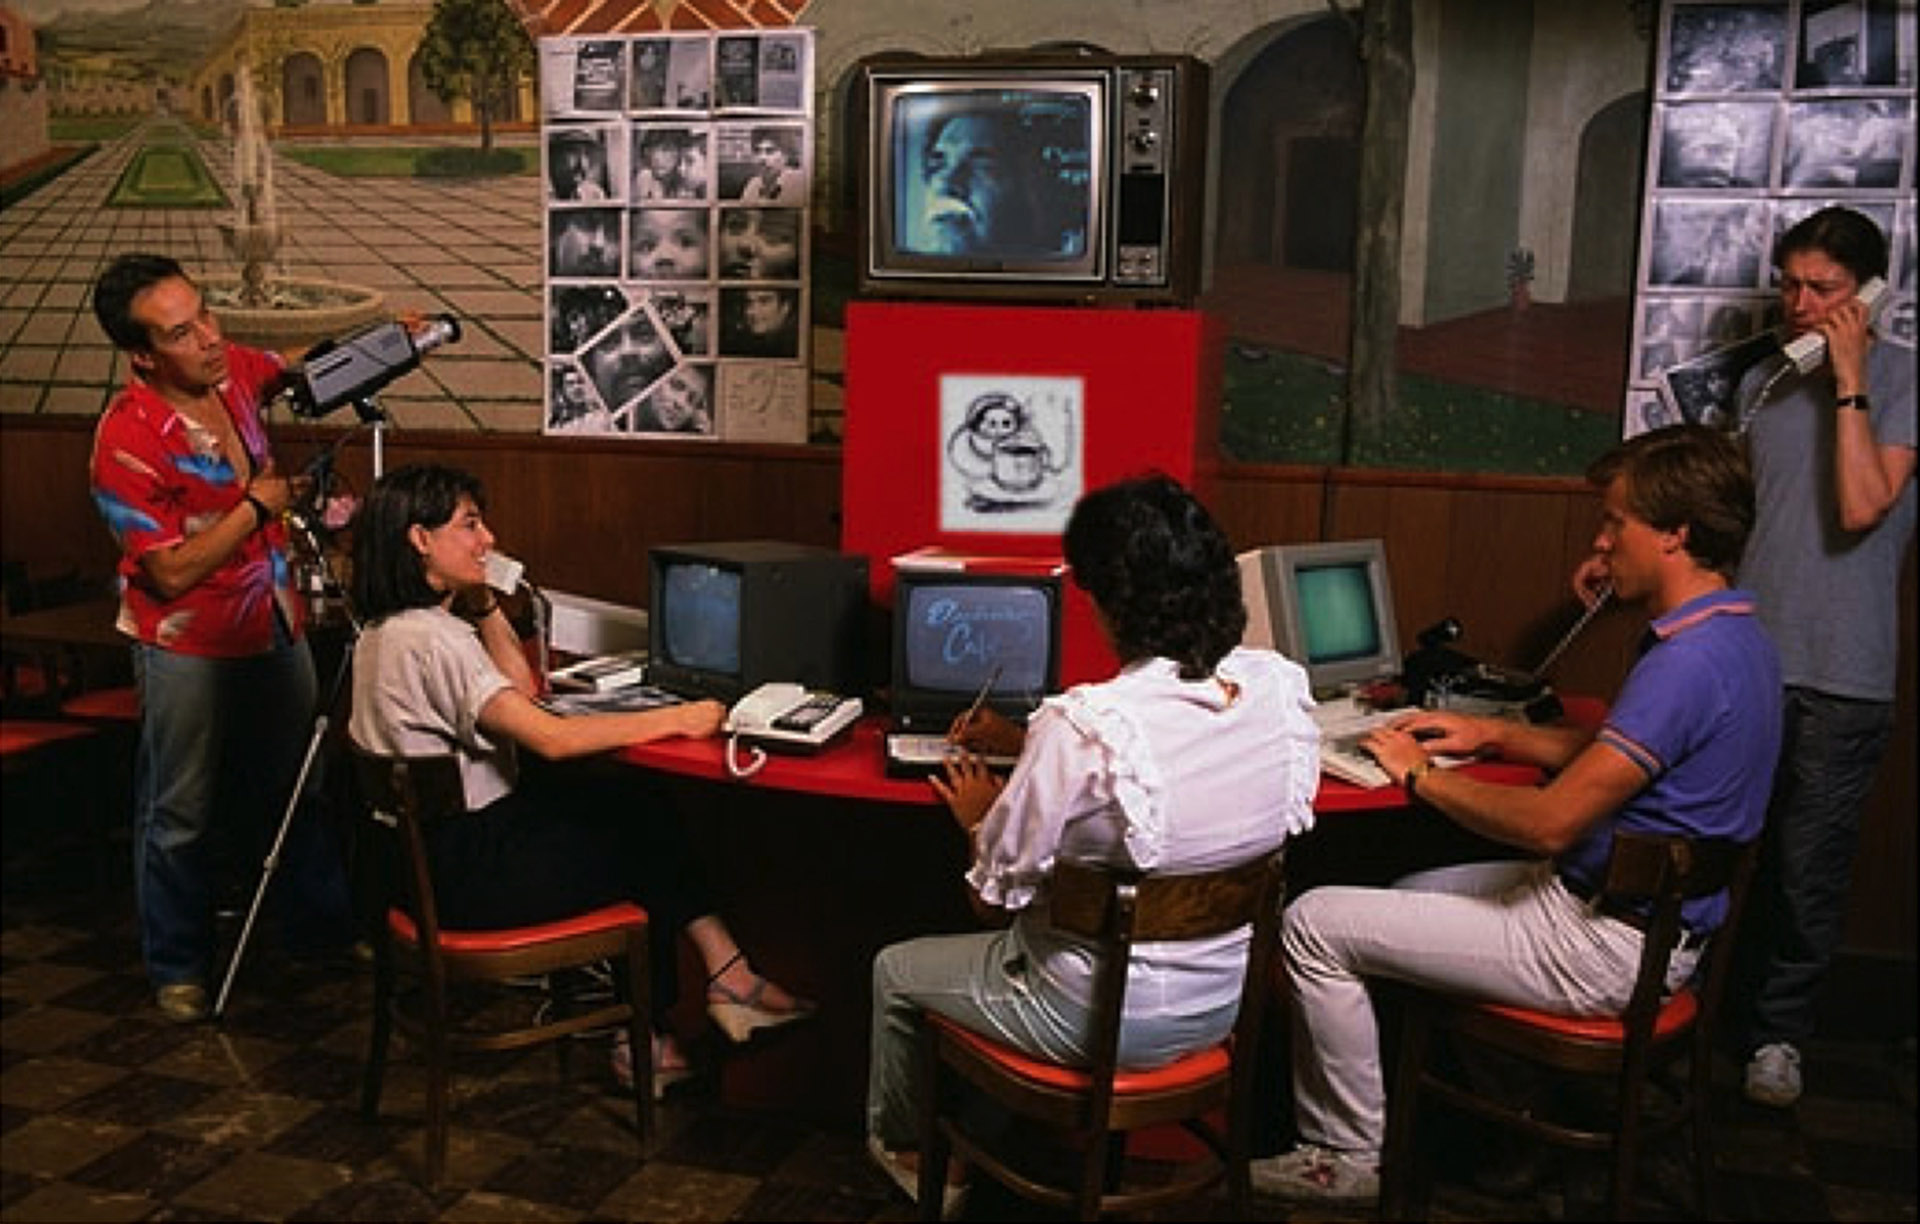 The Electronic Café